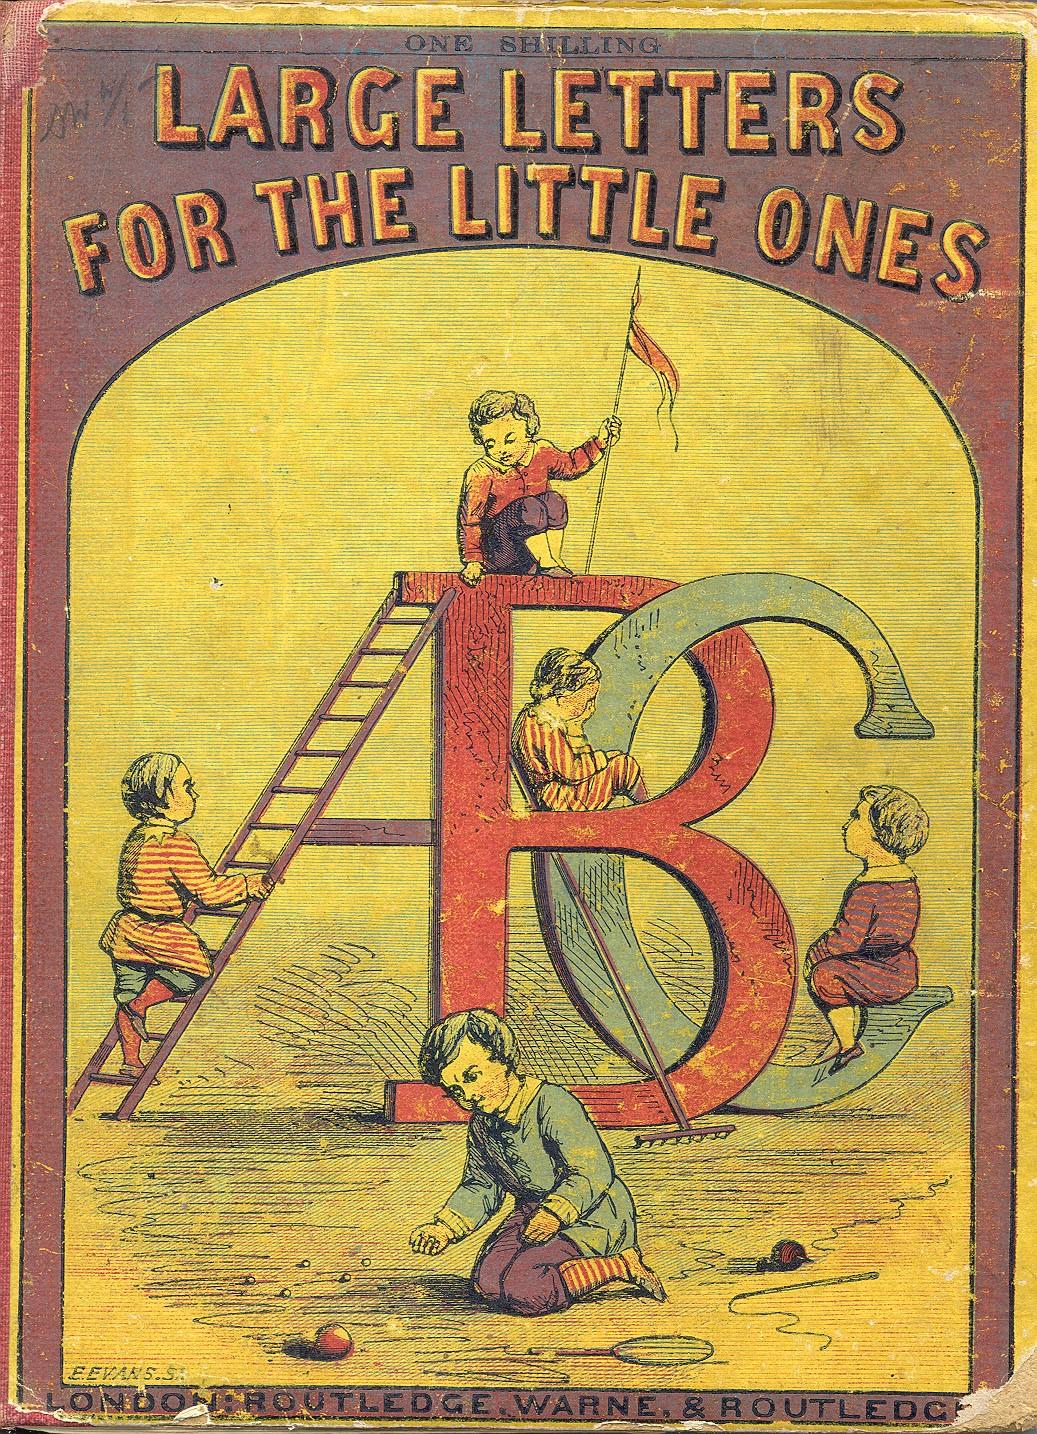 Large Letters for the Little Ones, Edmund Evans